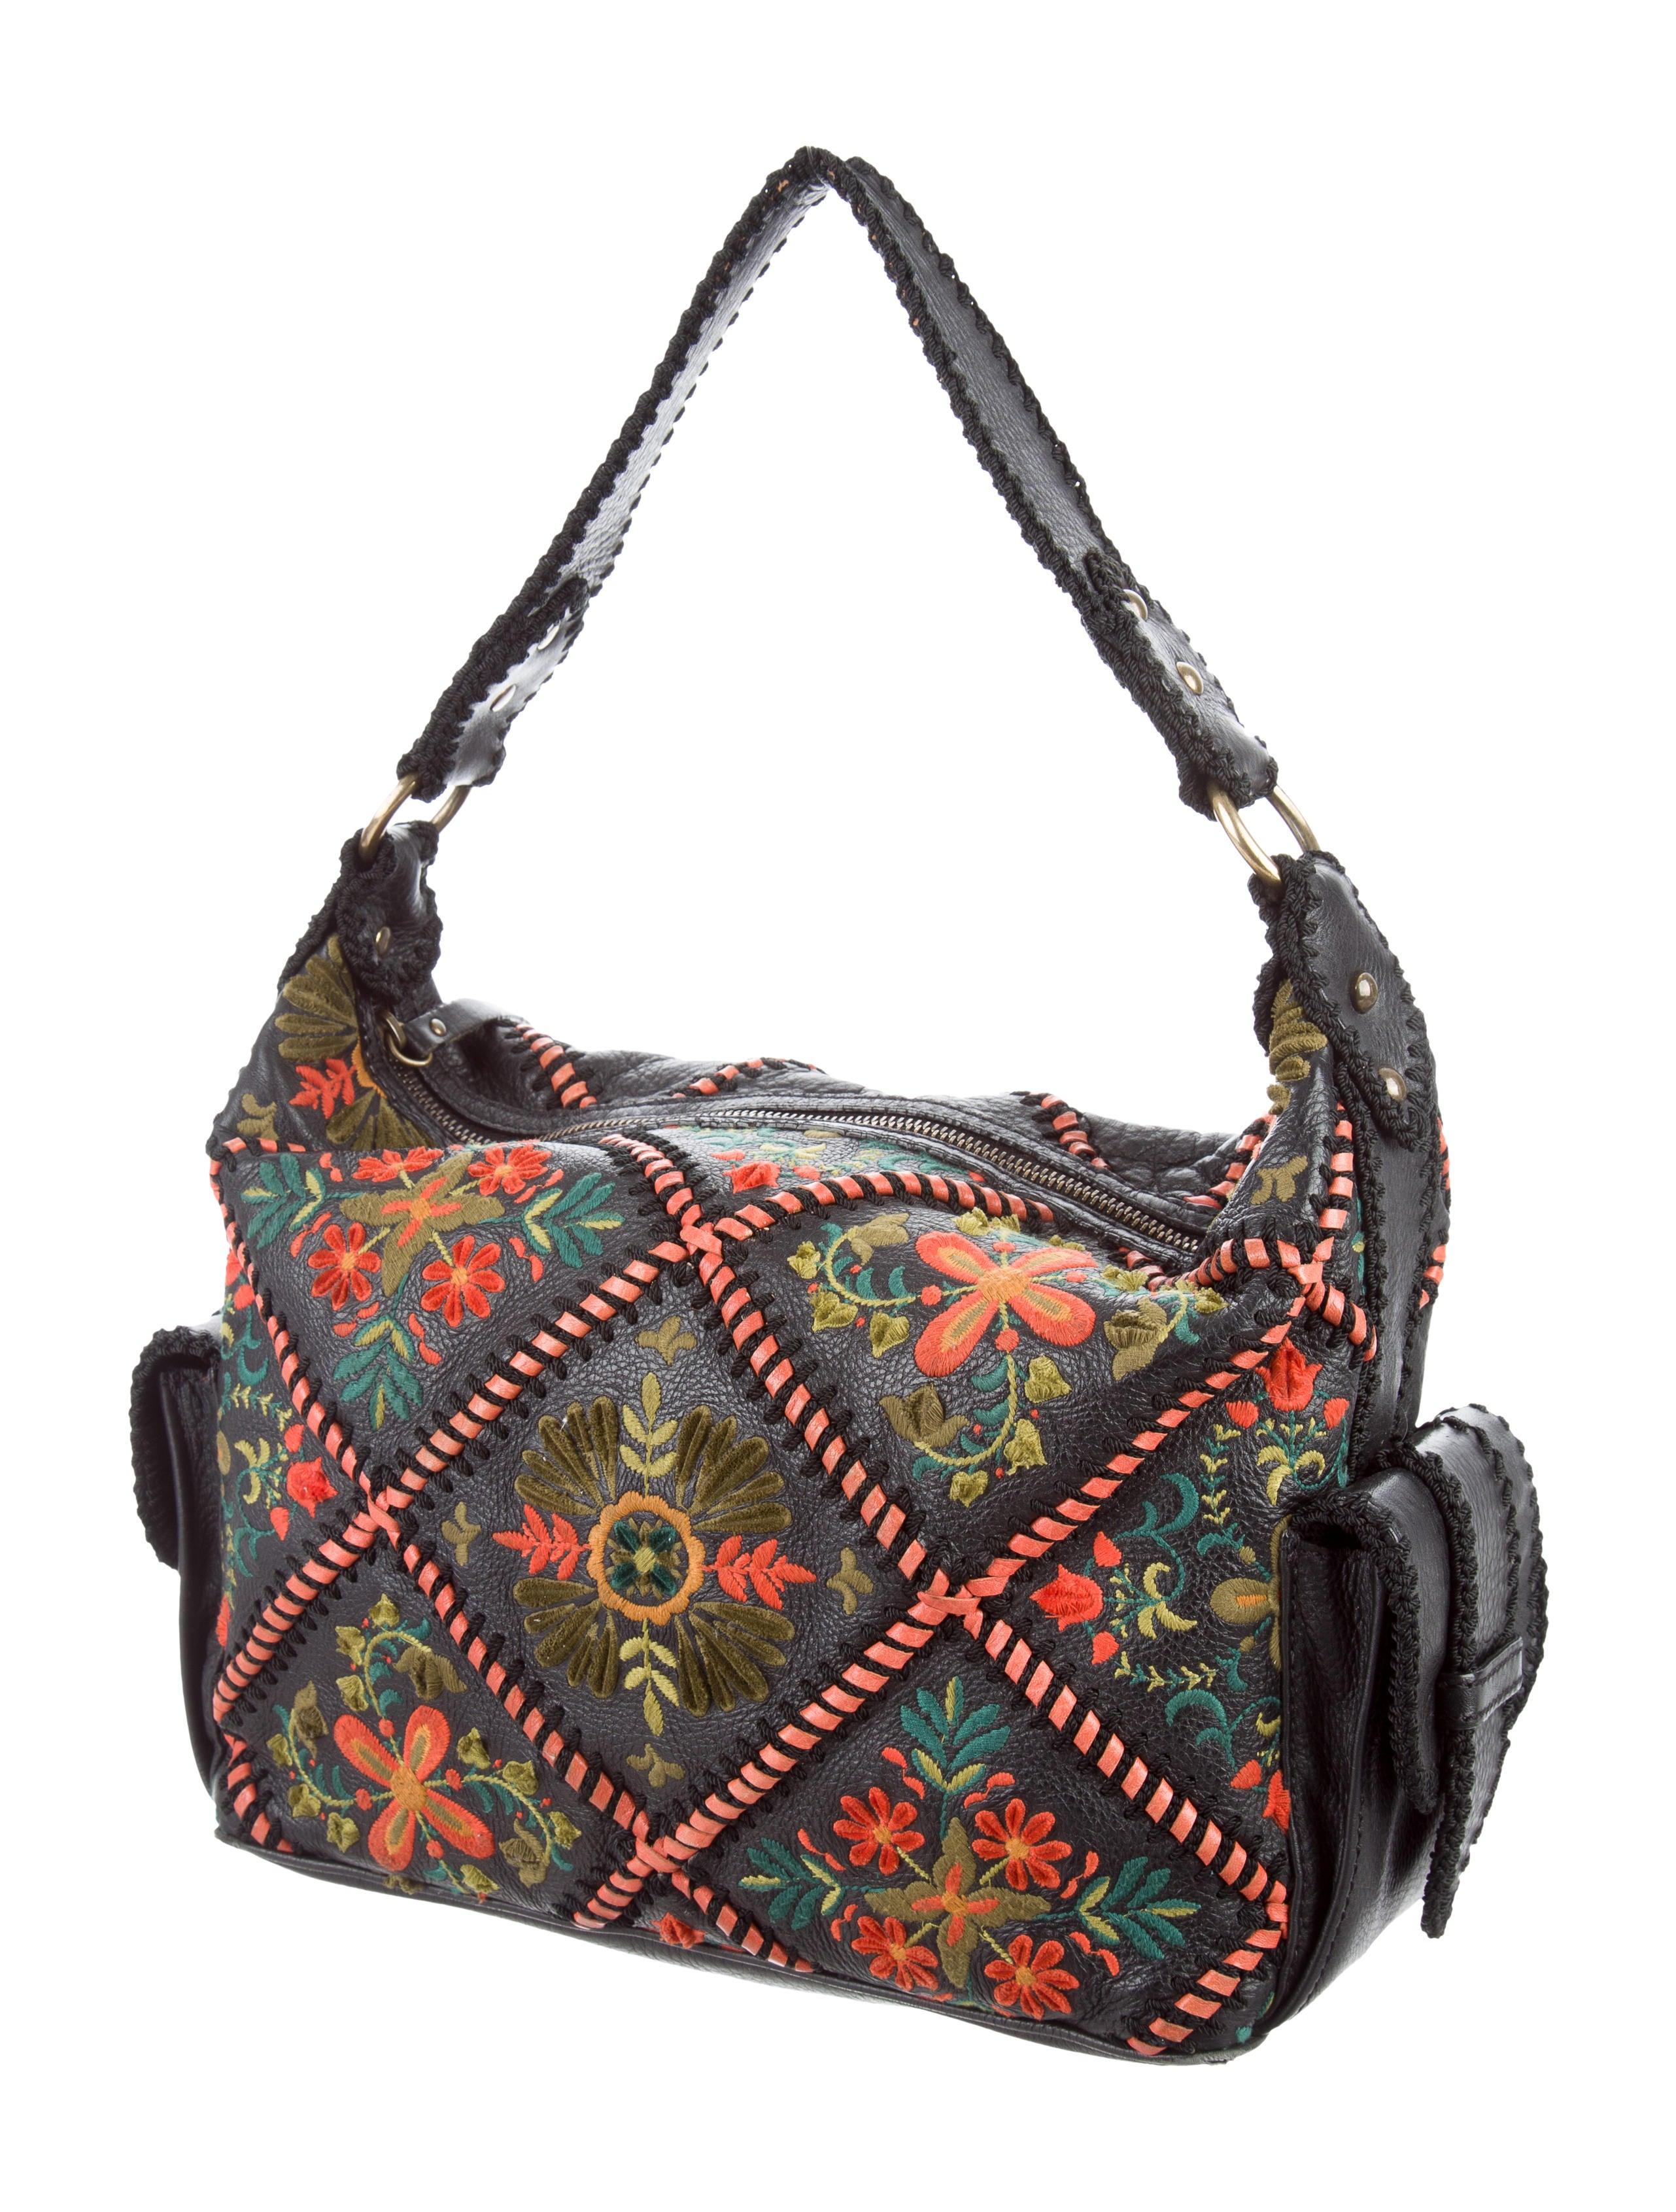 Isabella fiore embroidered shoulder bag handbags